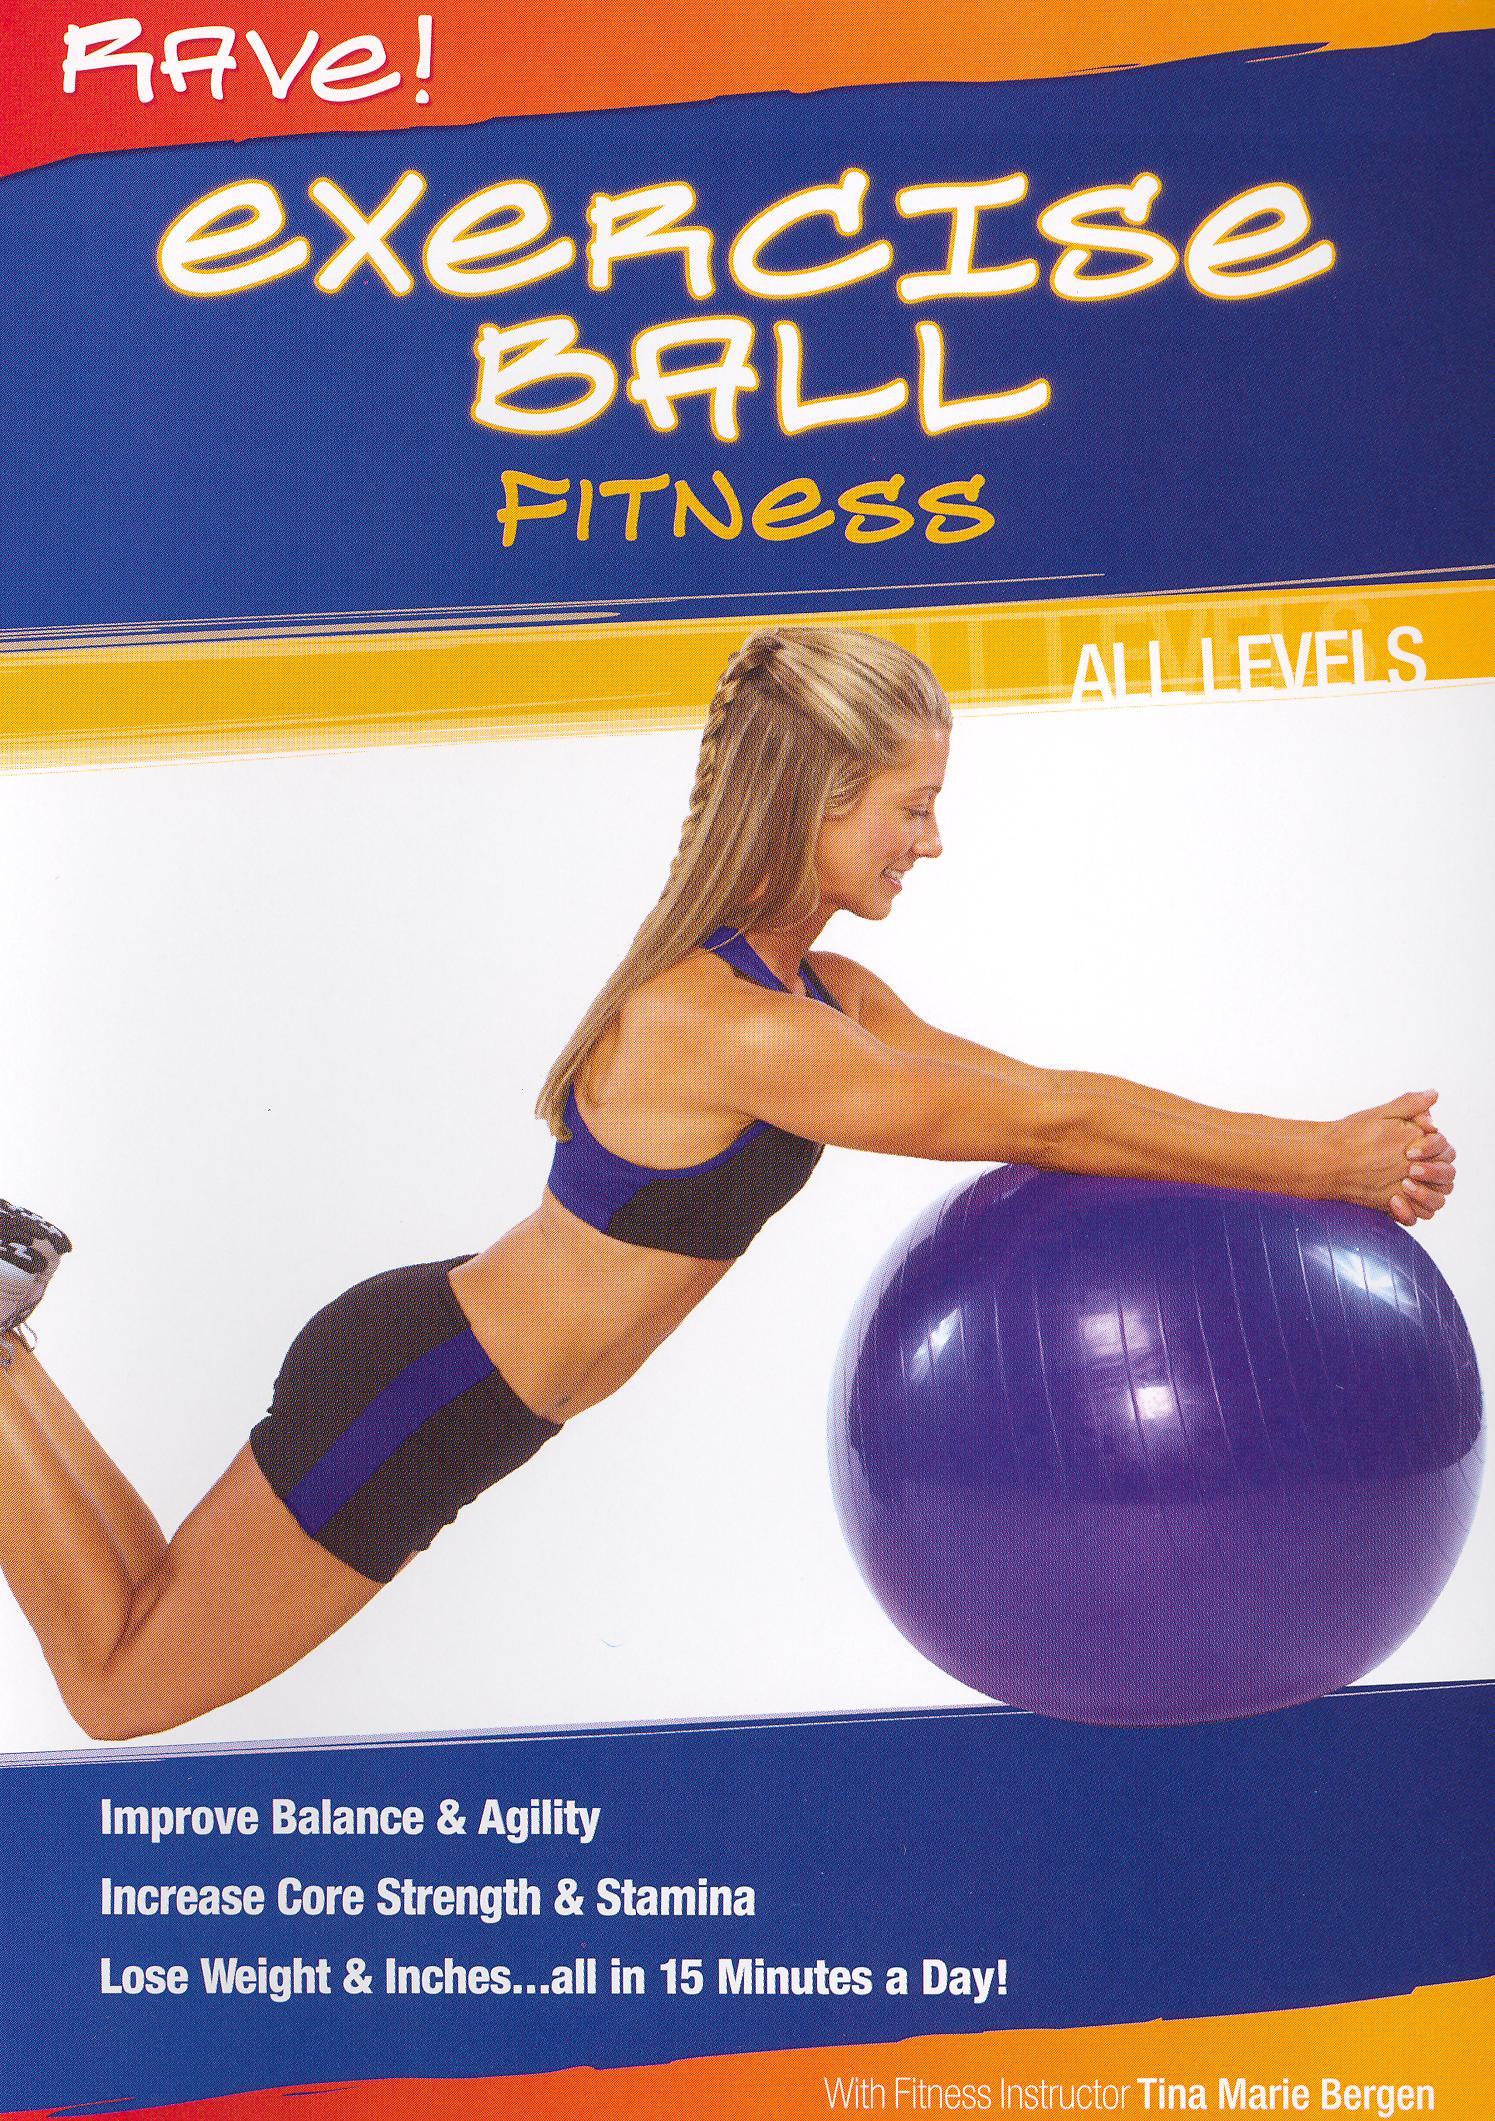 Rave! Exercise Ball Fitness